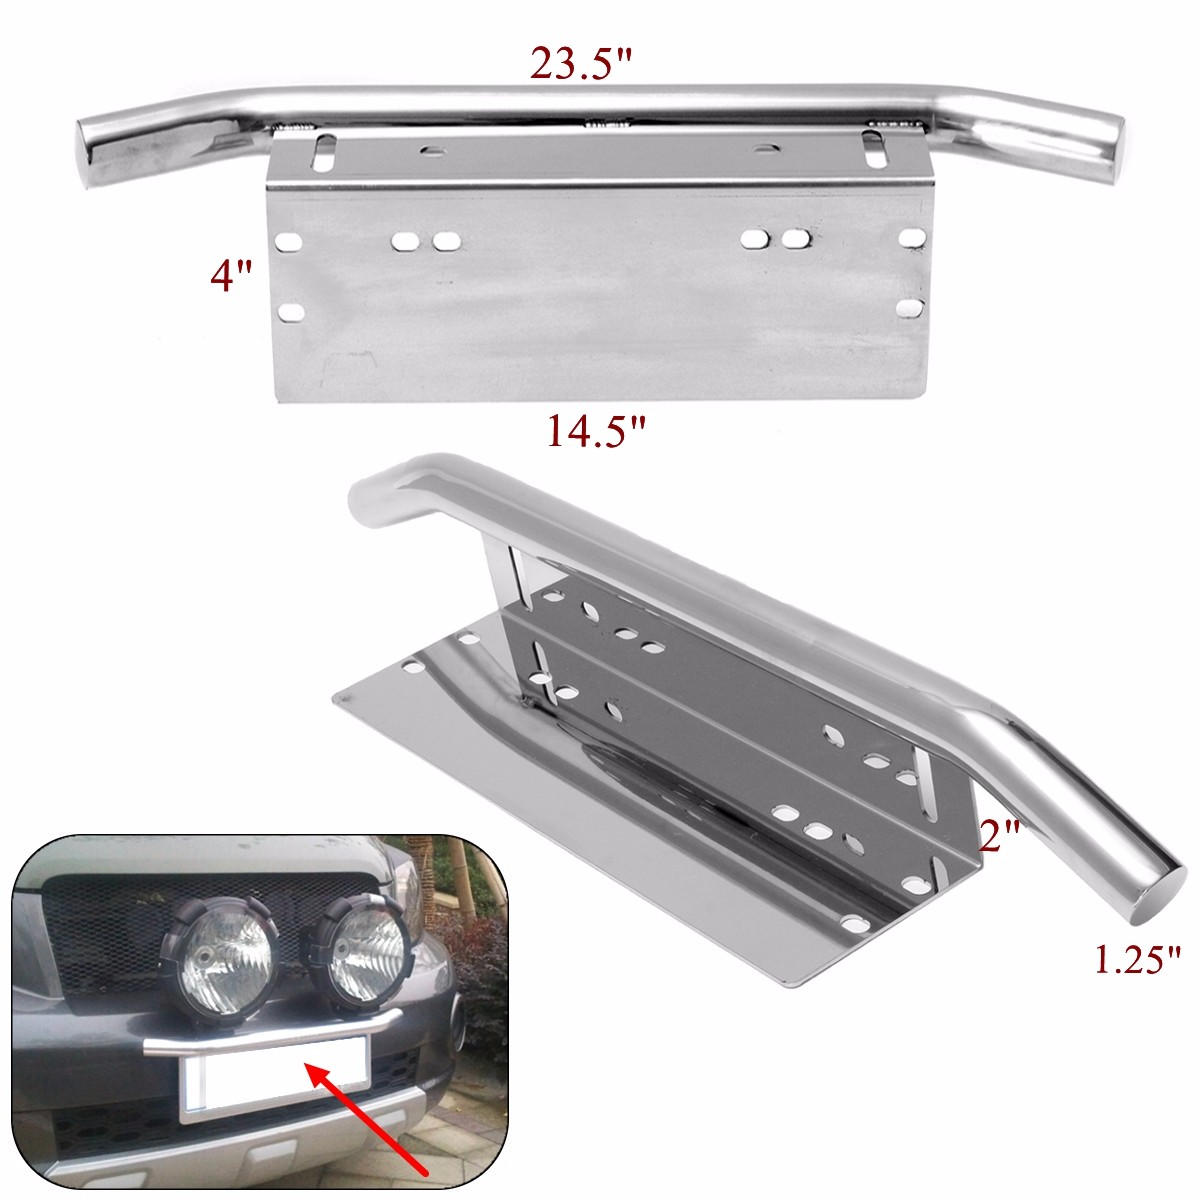 23inch Unversal Bull Bar Front Bumper Fog Working Lights License Plate Mount Braket Holder Offroad Light